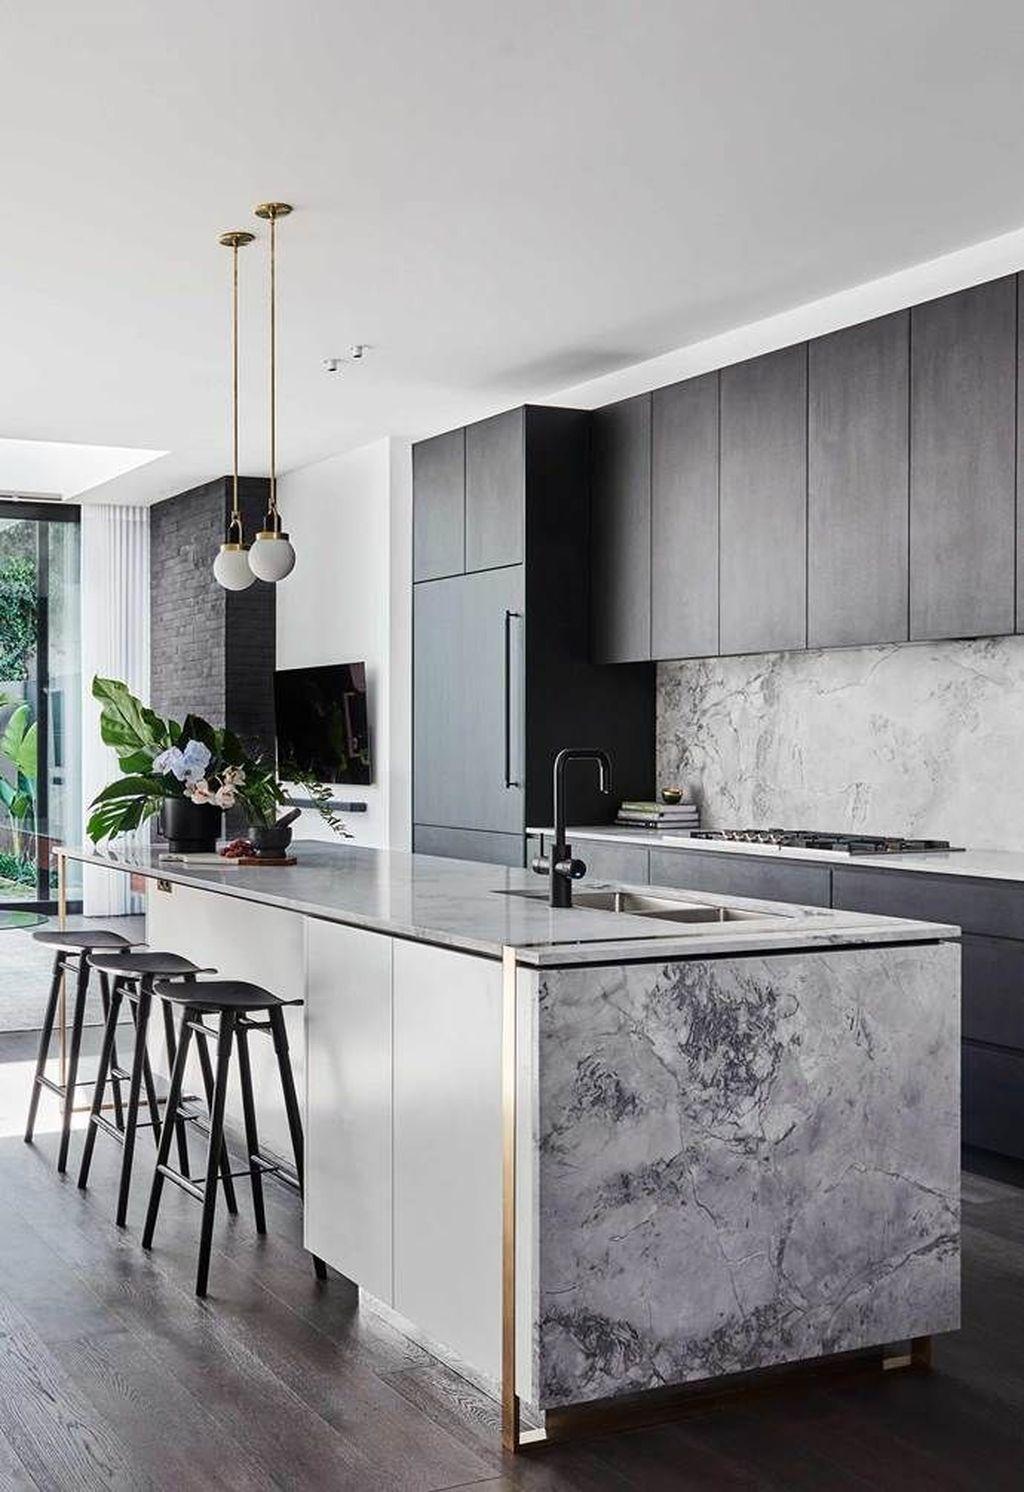 40 Gorgeous Modern Kitchen Design Ideas - HMDCRTN